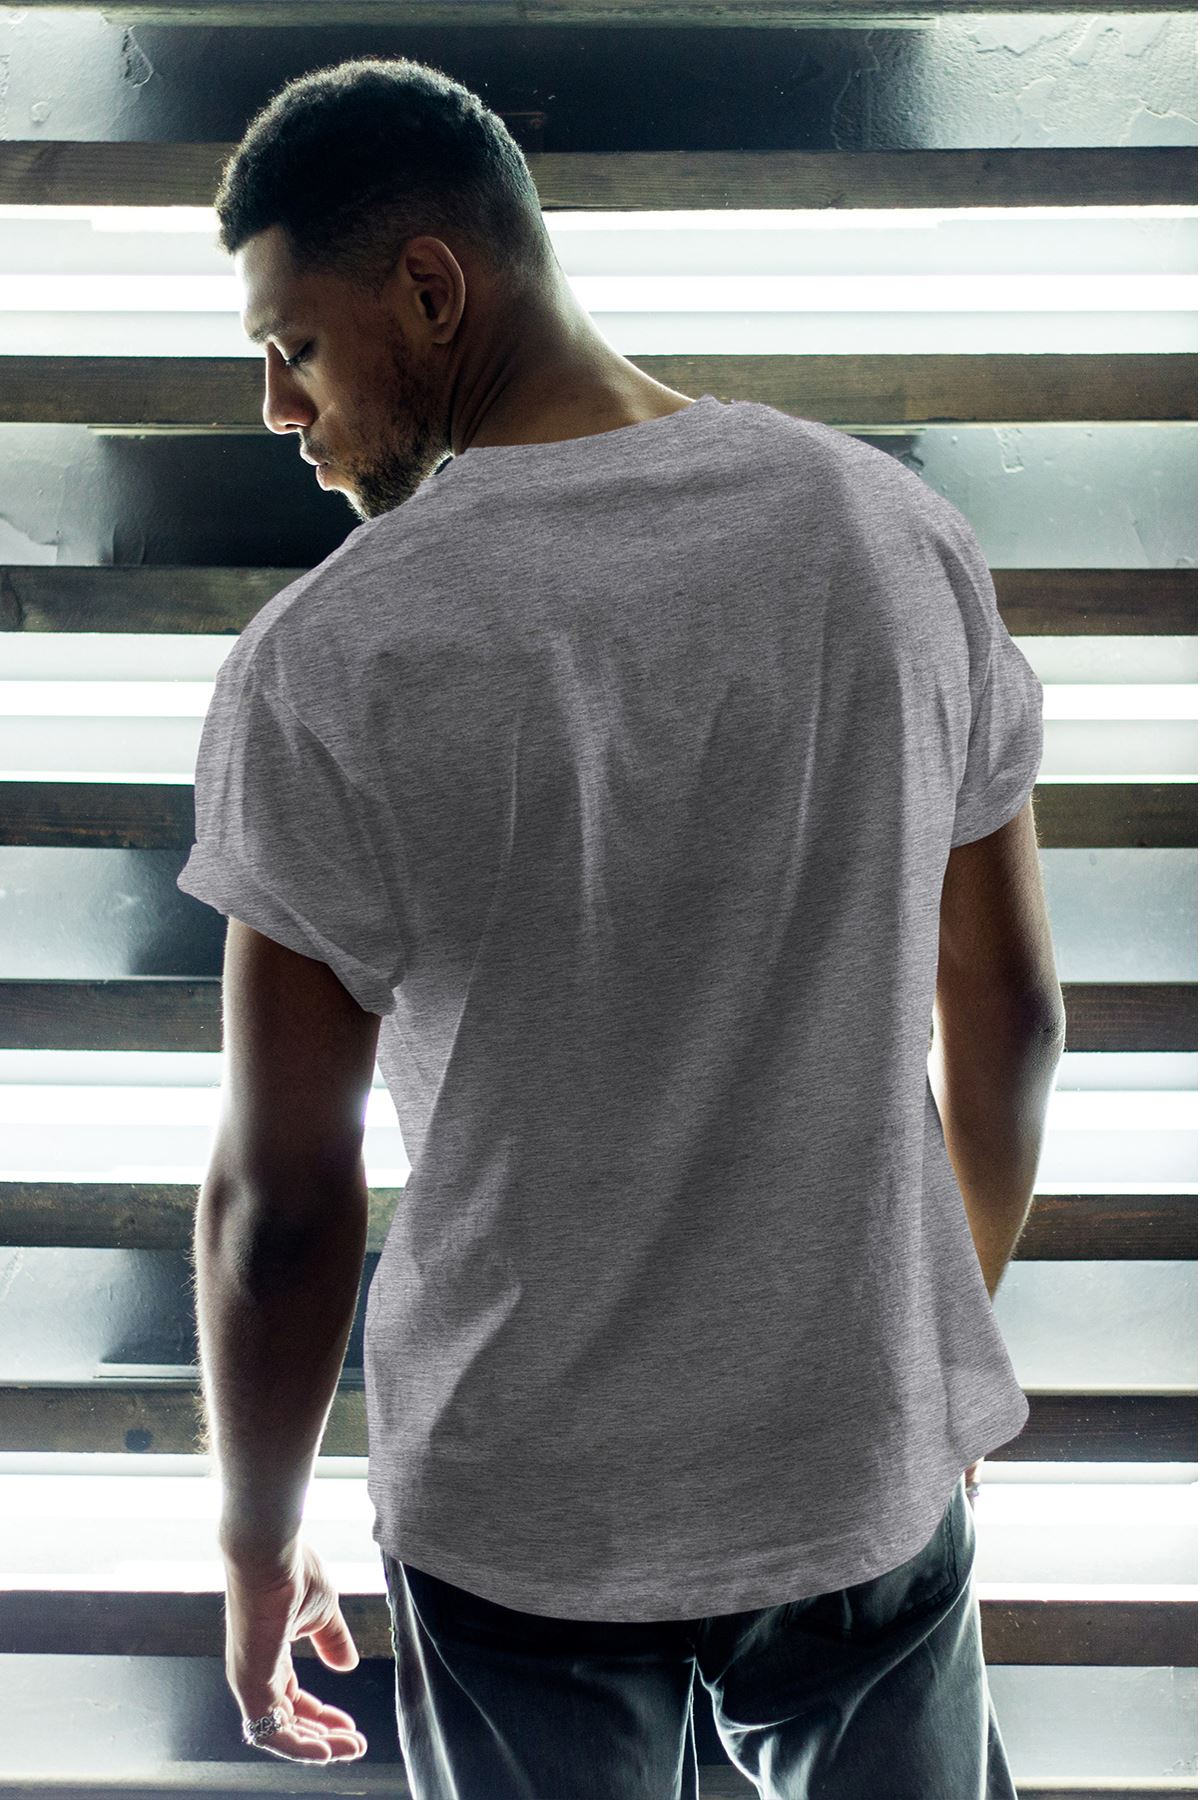 Anime Bang Gri Erkek Oversize Tshirt - Tişört